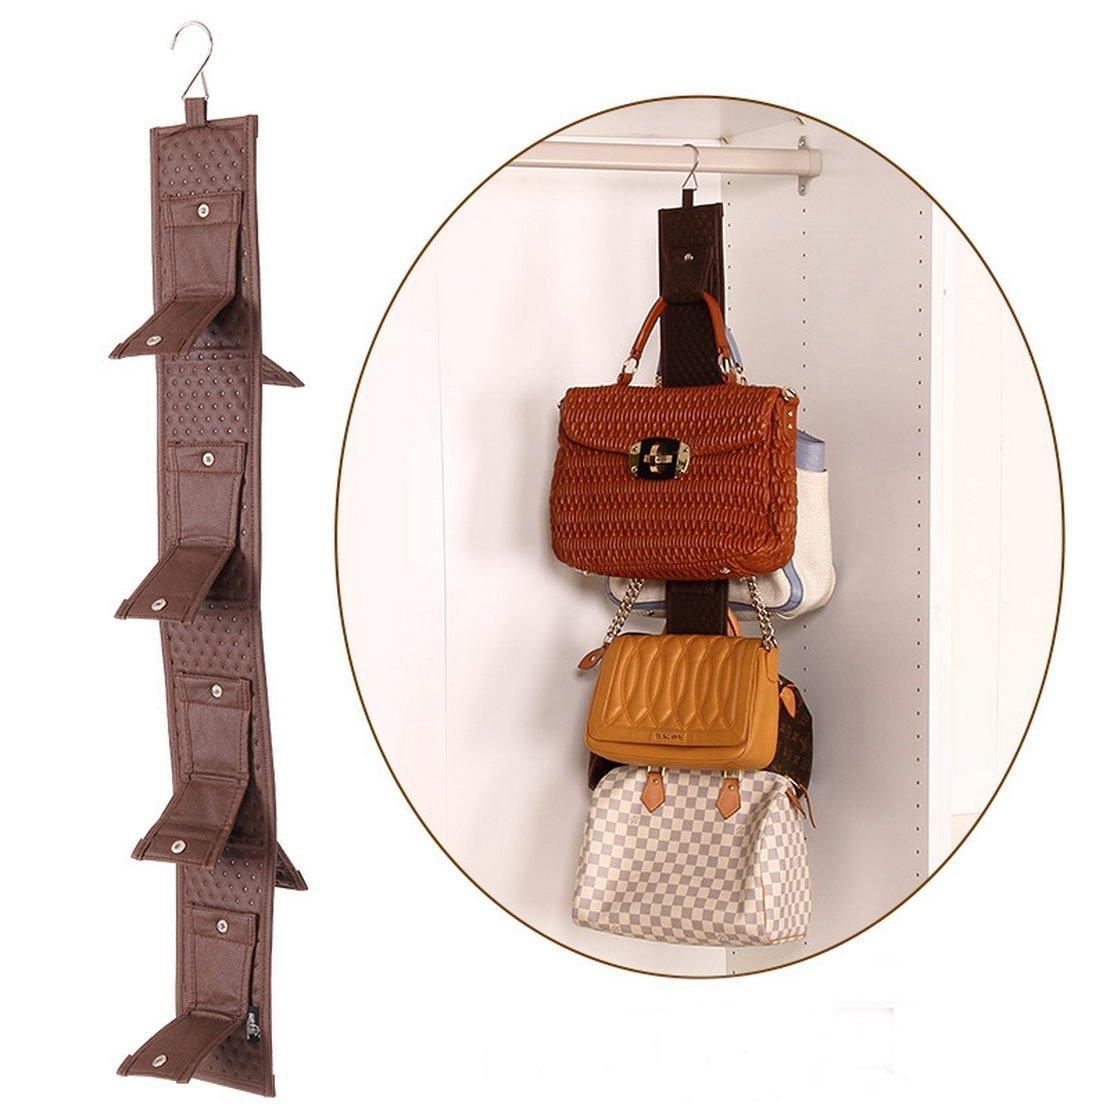 vector storage of organizers shoe interior racks realistic stock rails wardrobe bedroom closet illustration hanging clothes